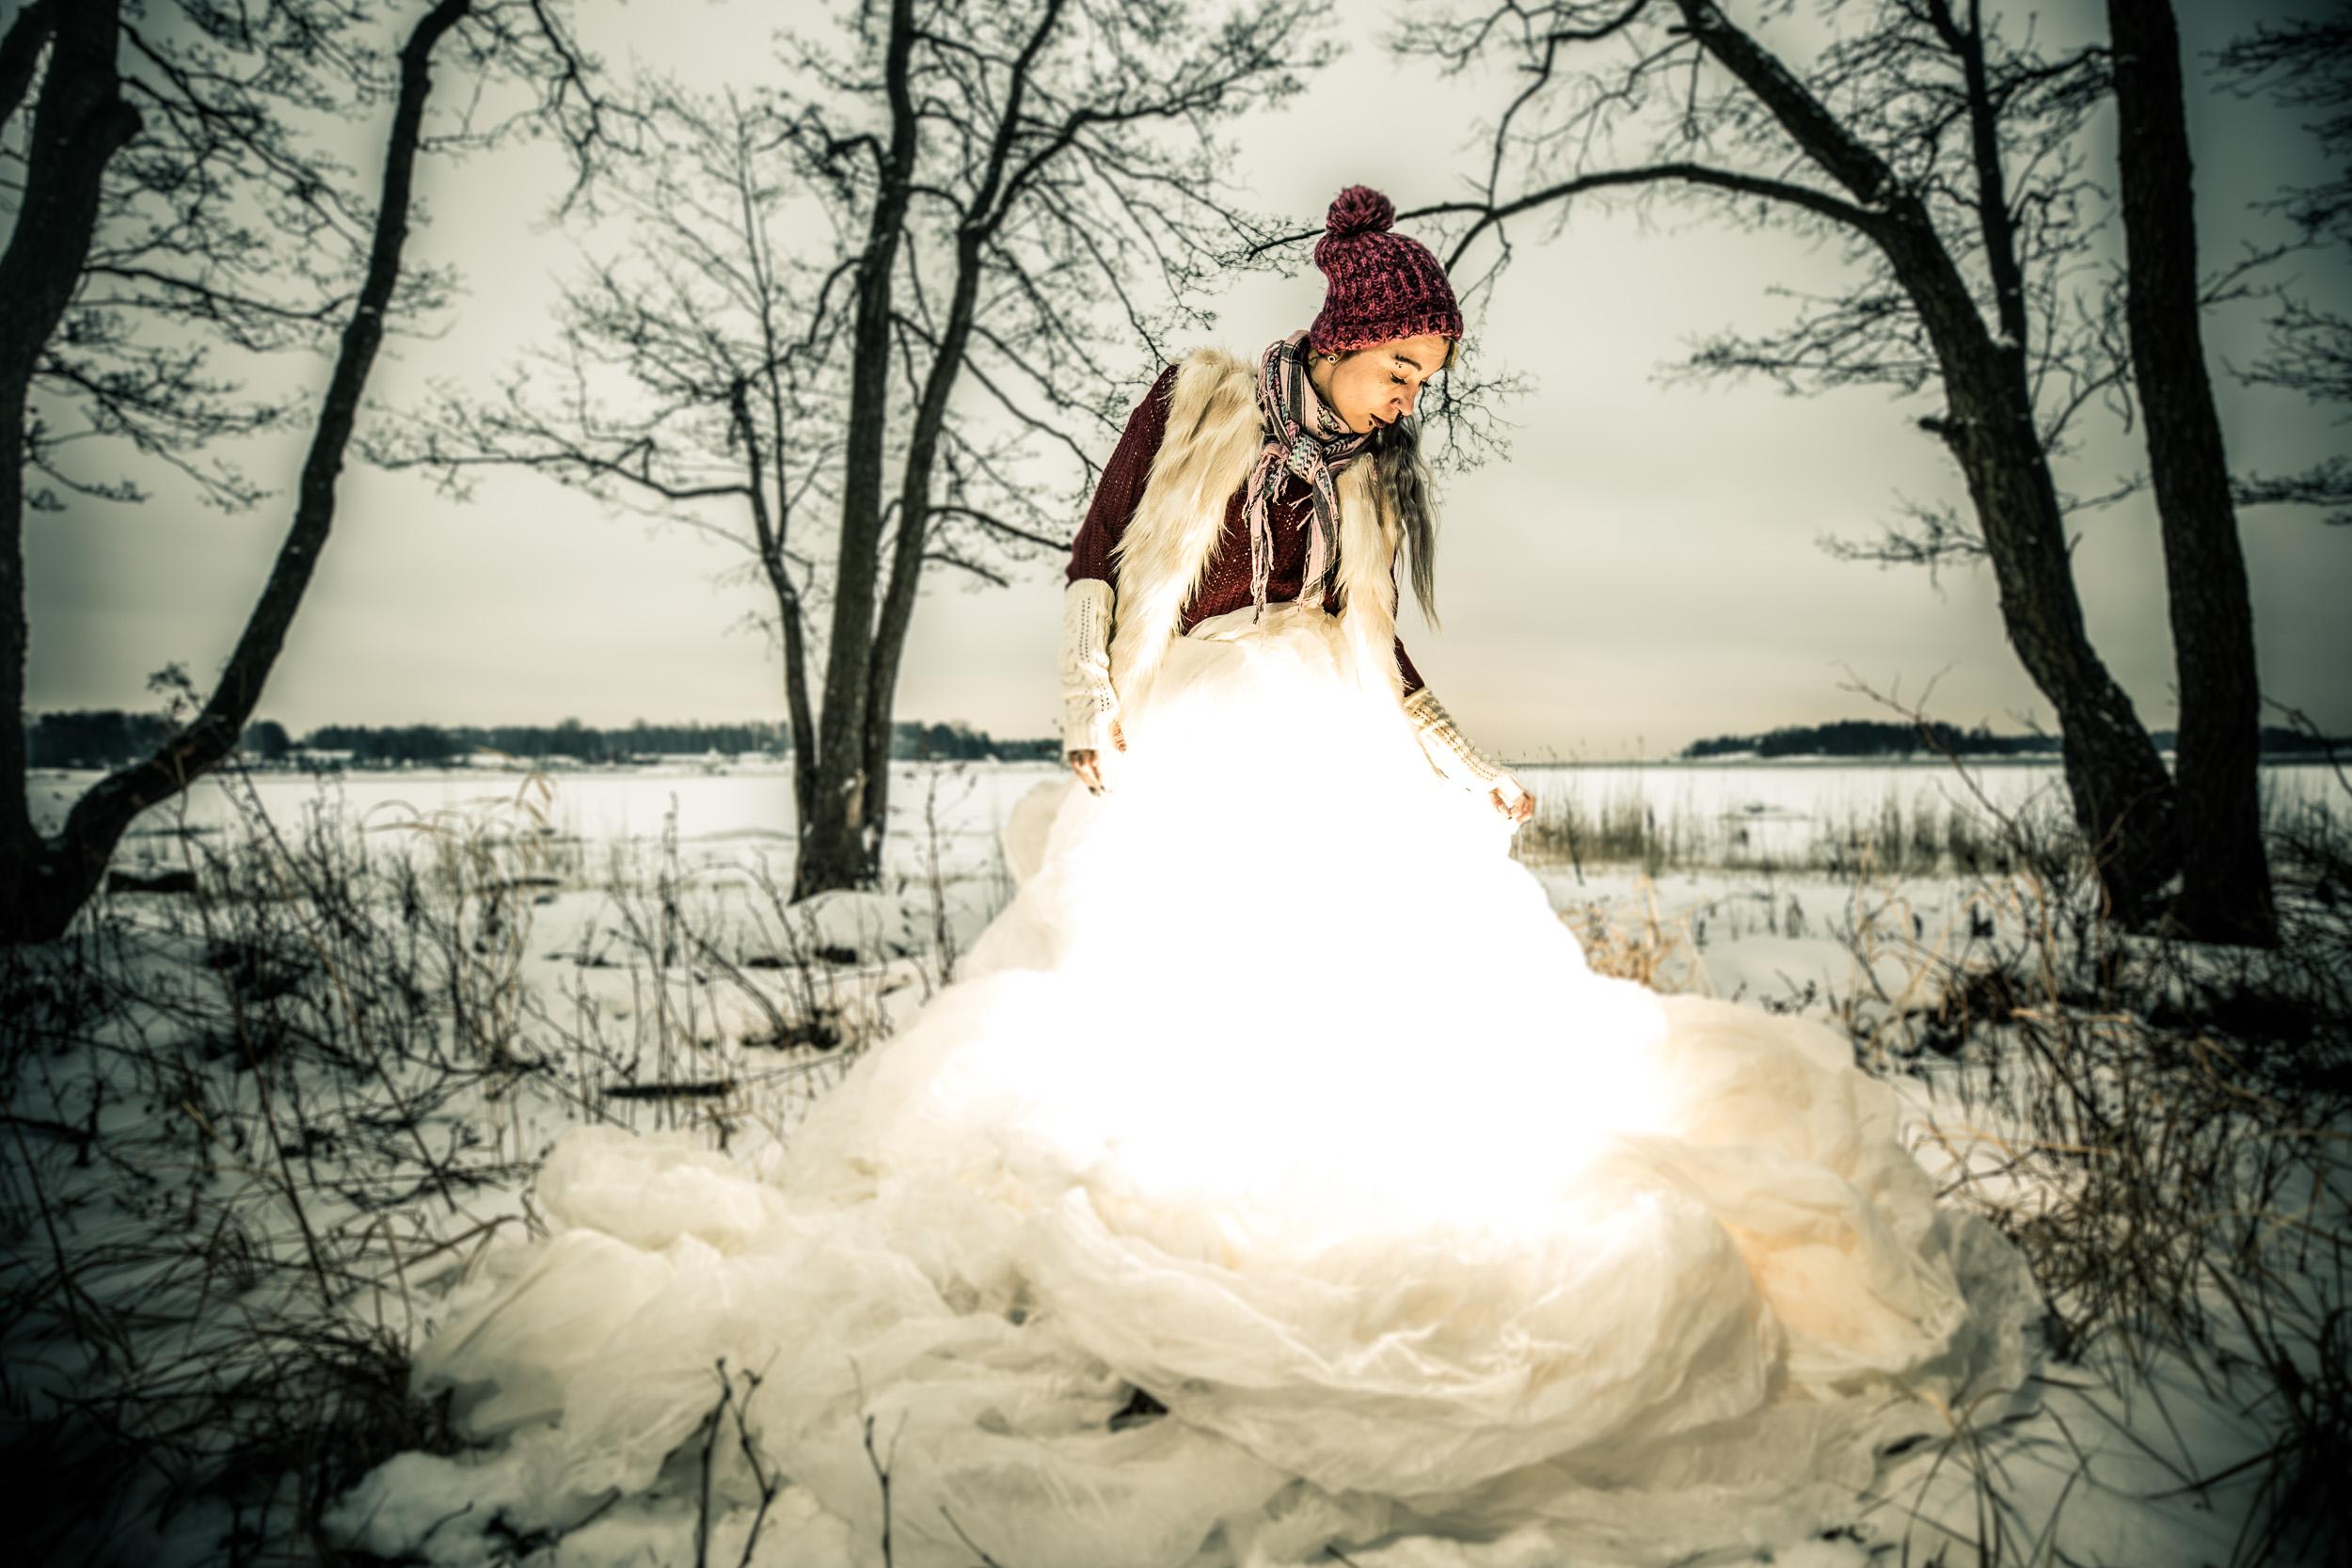 The Winter Fire Fairy (with Neko Devilish) © Alejandro Lorenzo